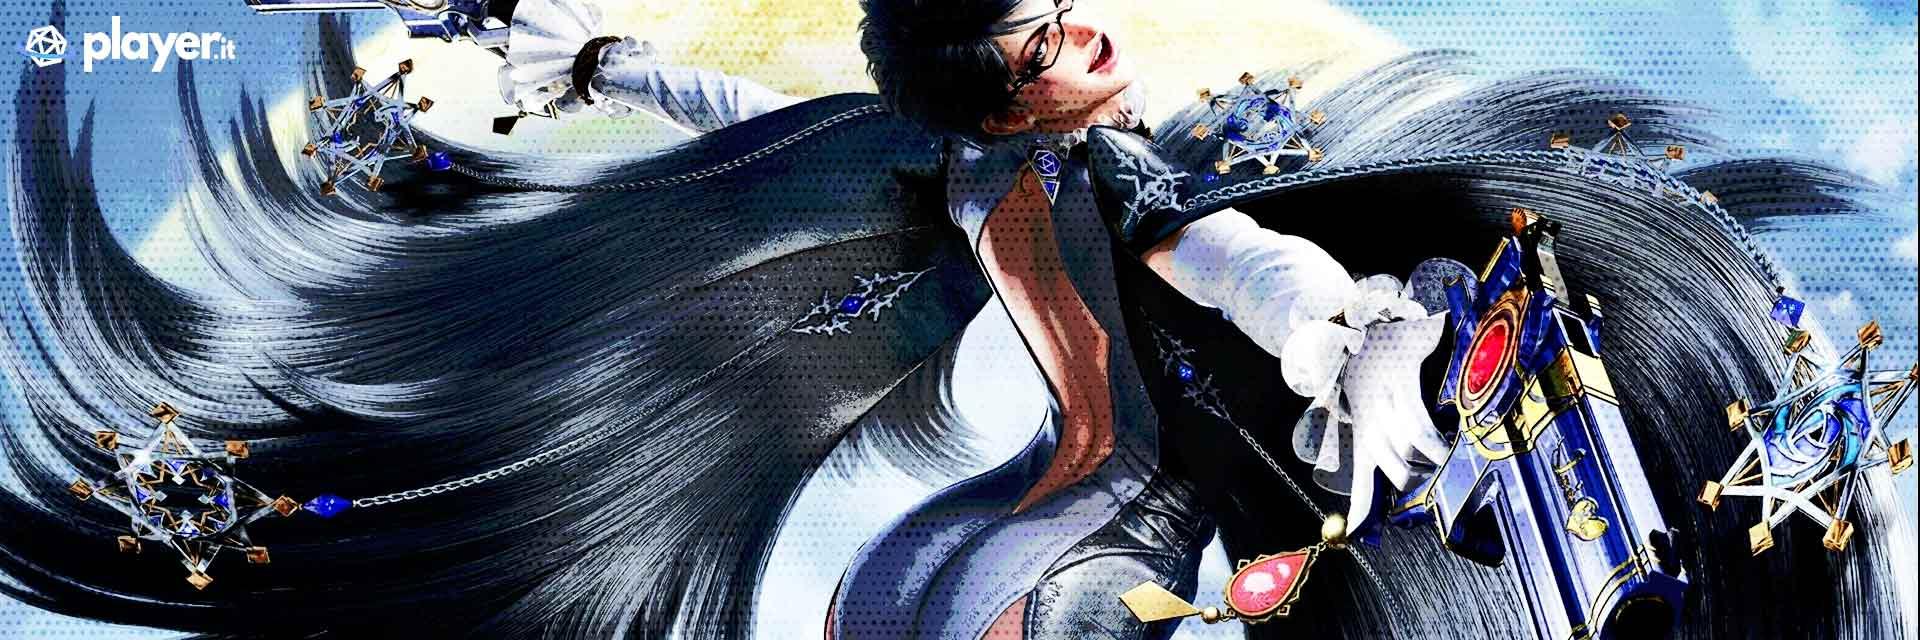 bayonetta 2 wallpaper in hd